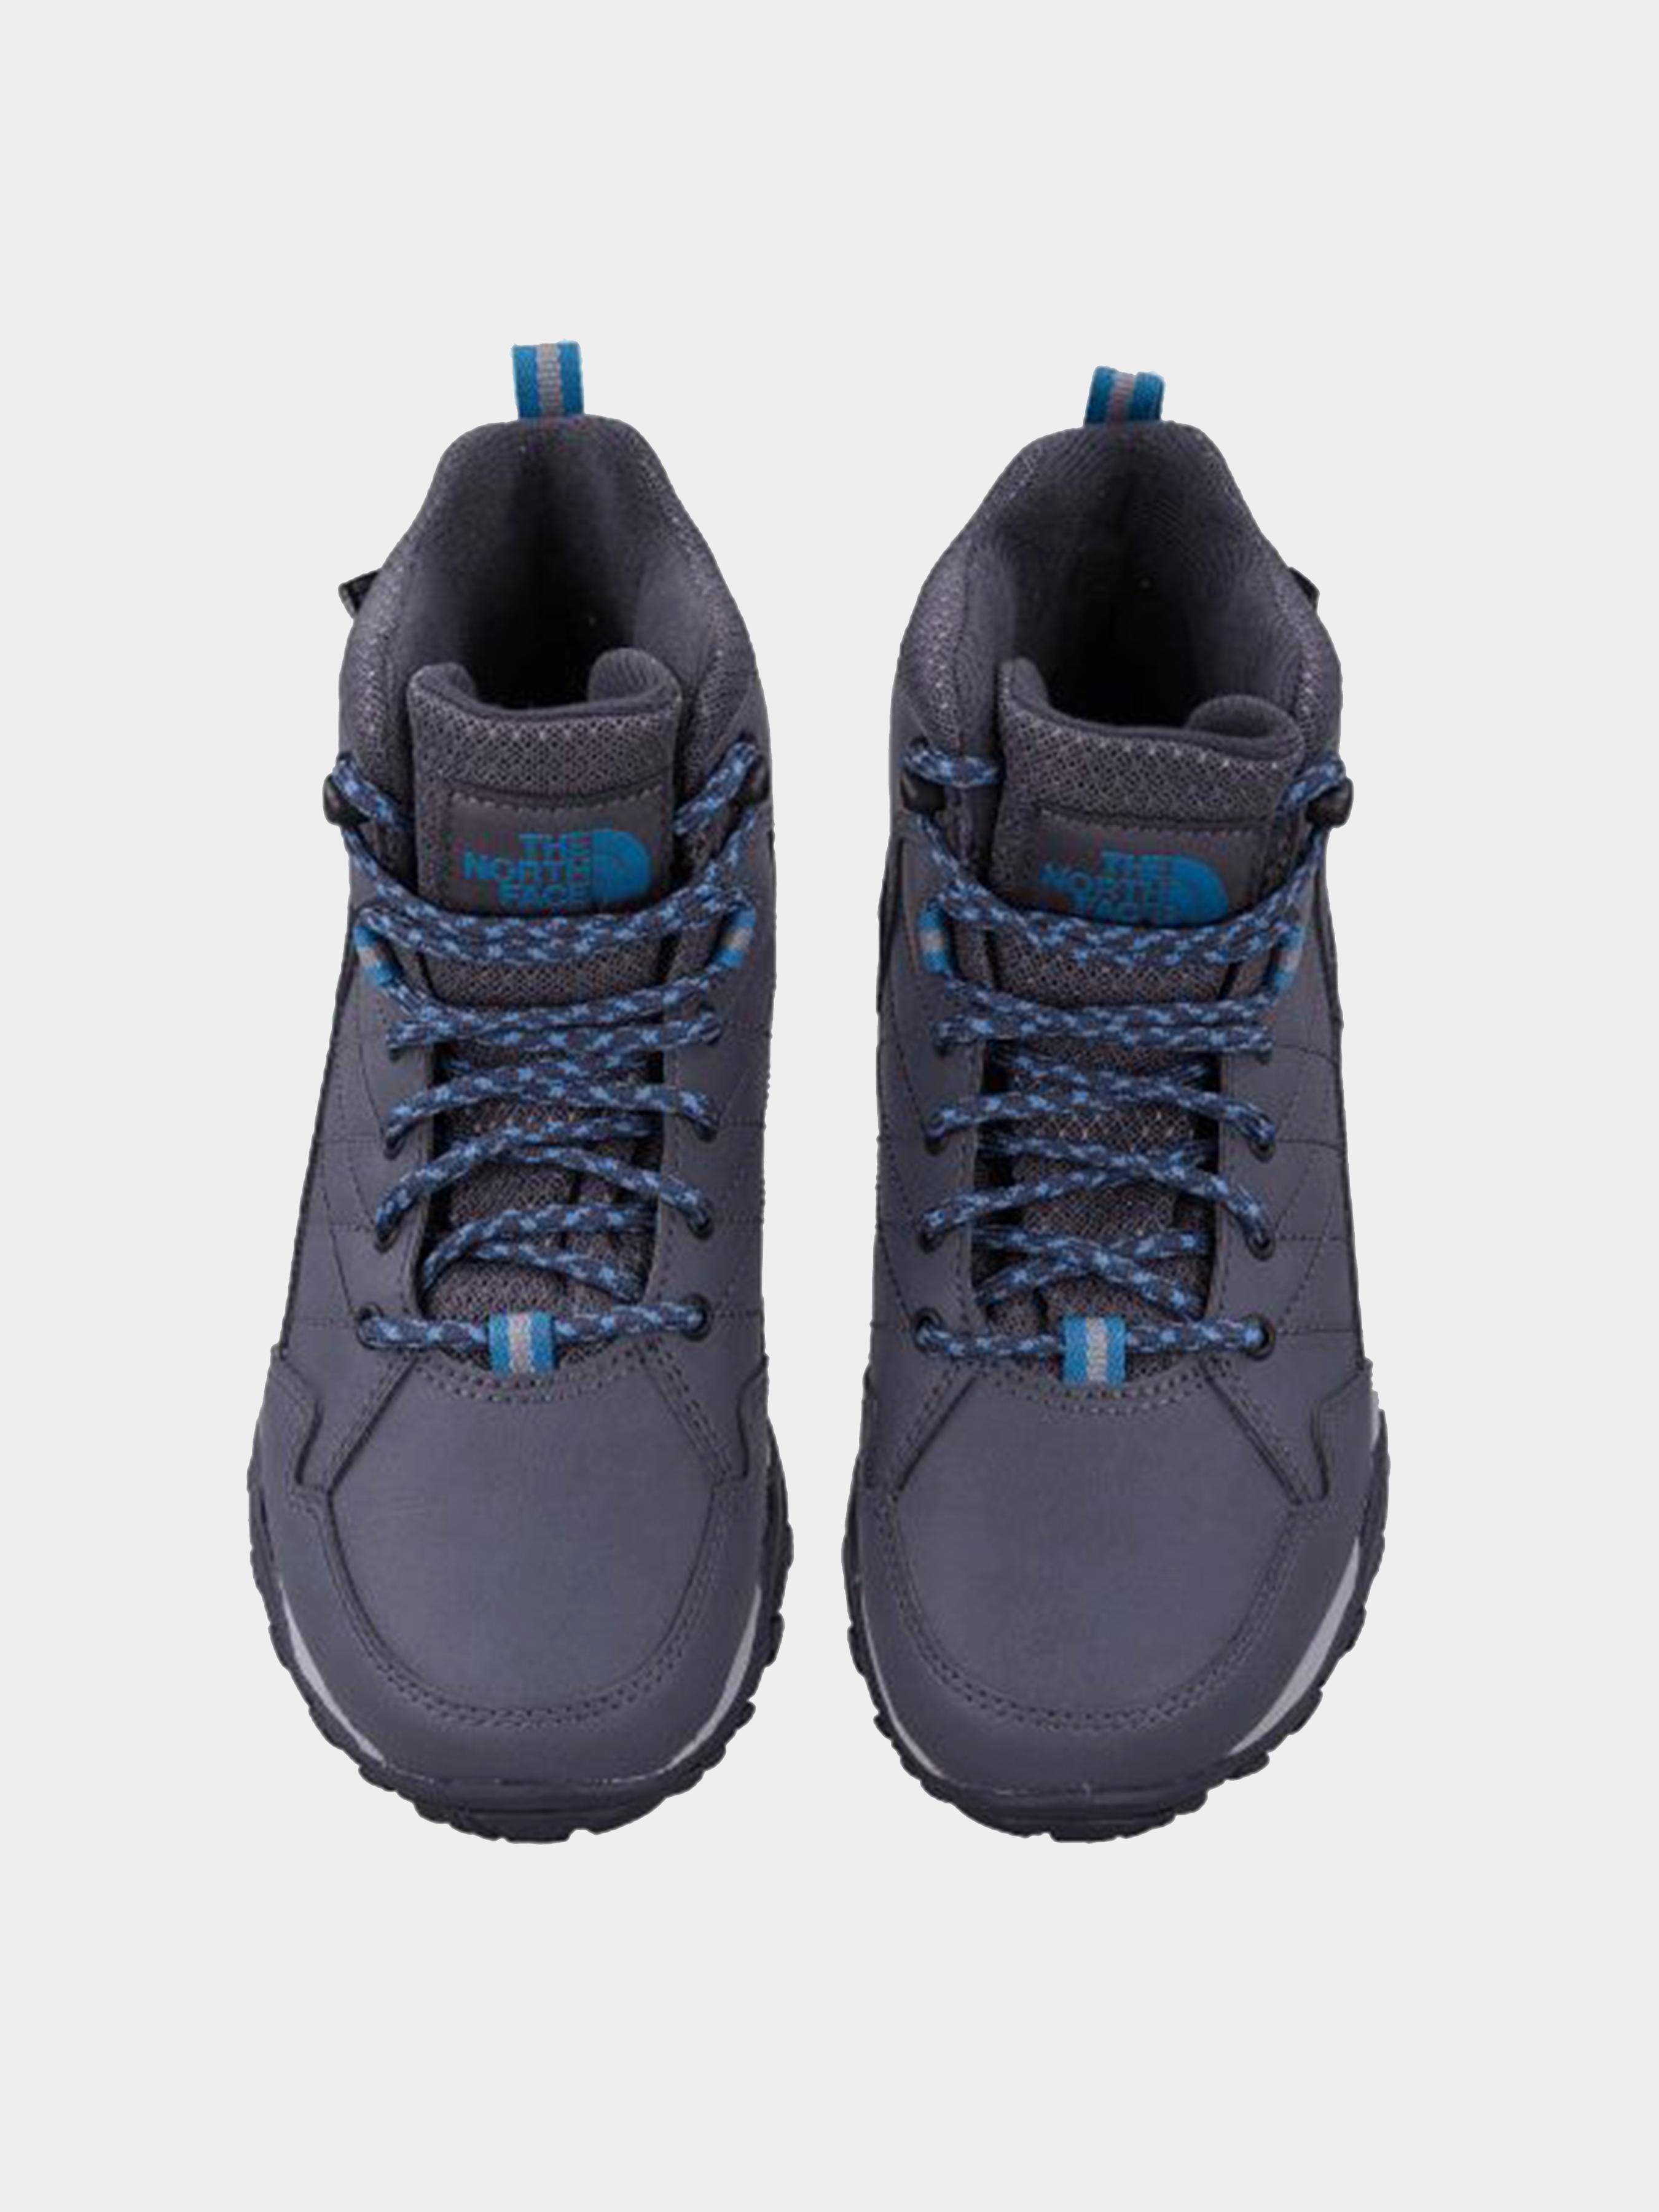 Ботинки для женщин The North Face Storm Strike II Wp NO9786 примерка, 2017